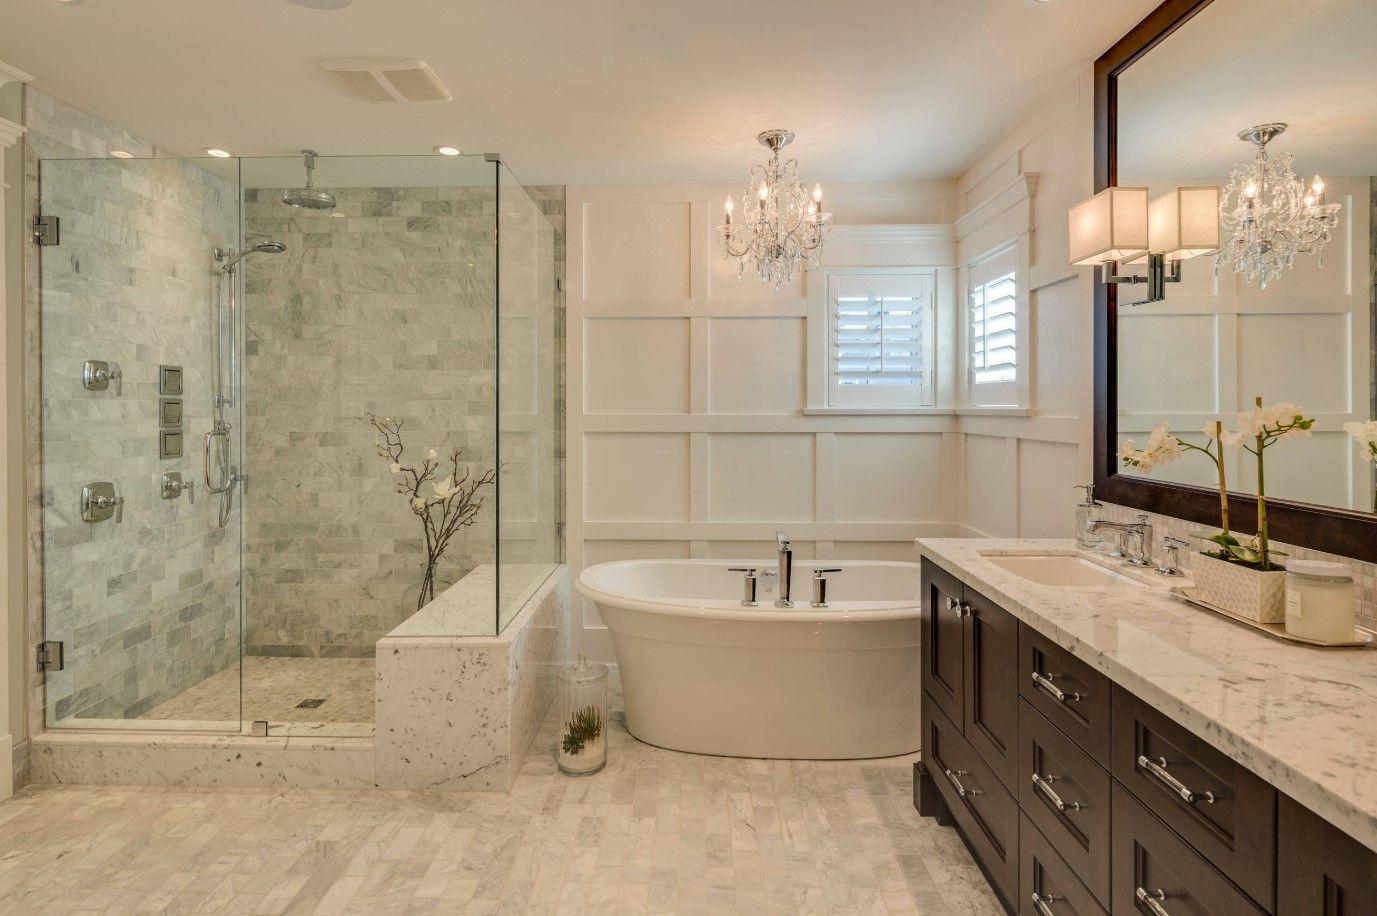 Build A Better Bathroom 6 Bathroom Upgrades Worth The Money Https Freshome Com Bathroom Upgr Bathroom Remodel Designs Bathroom Floor Plans Bathroom Trends